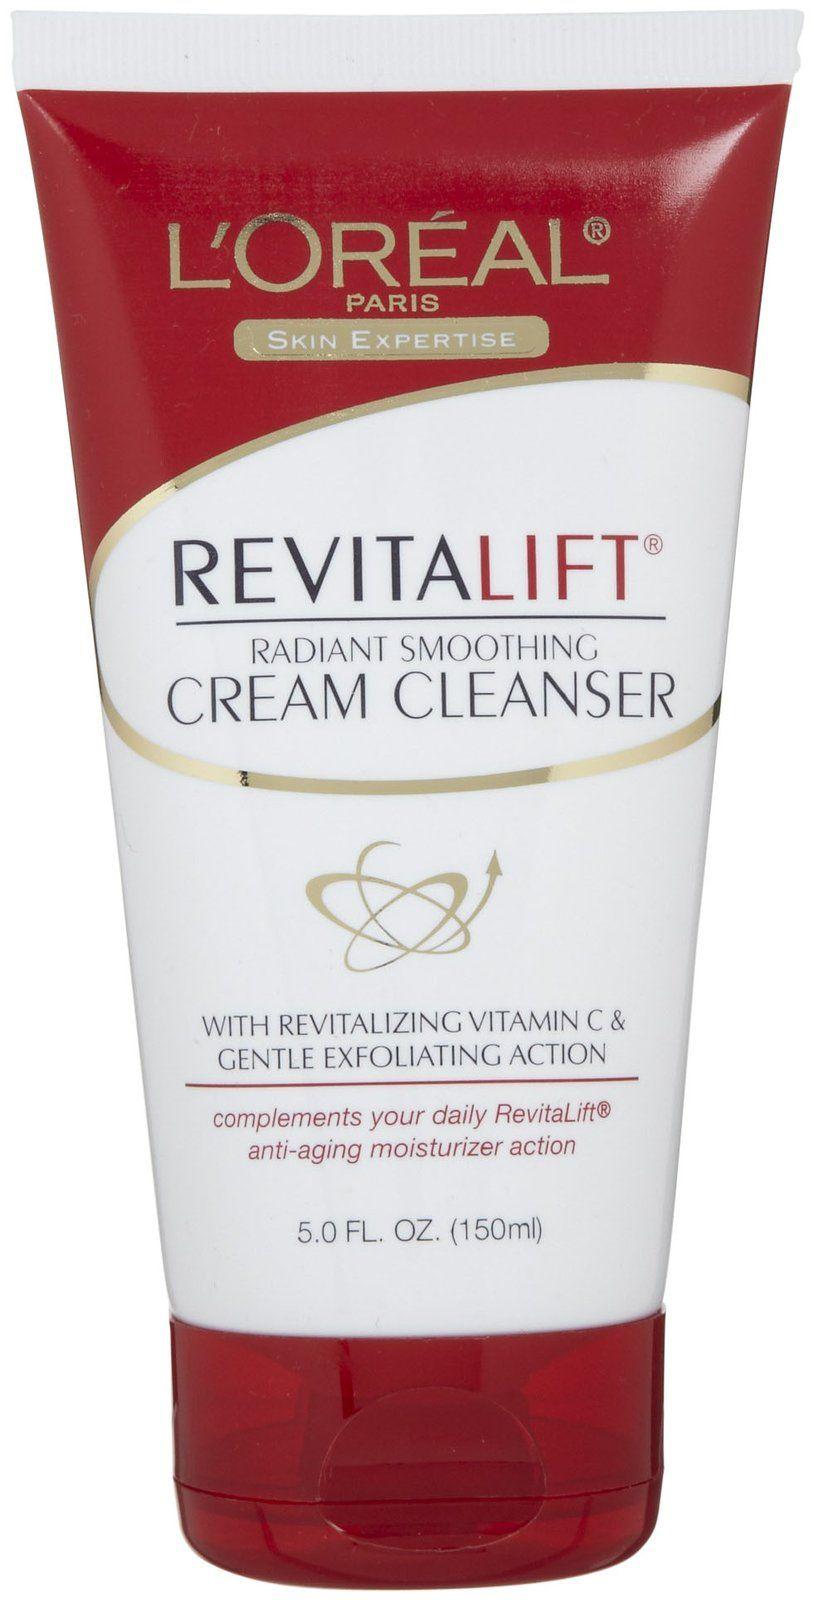 L'Oreal Revitalift Cream Cleanser 5 oz